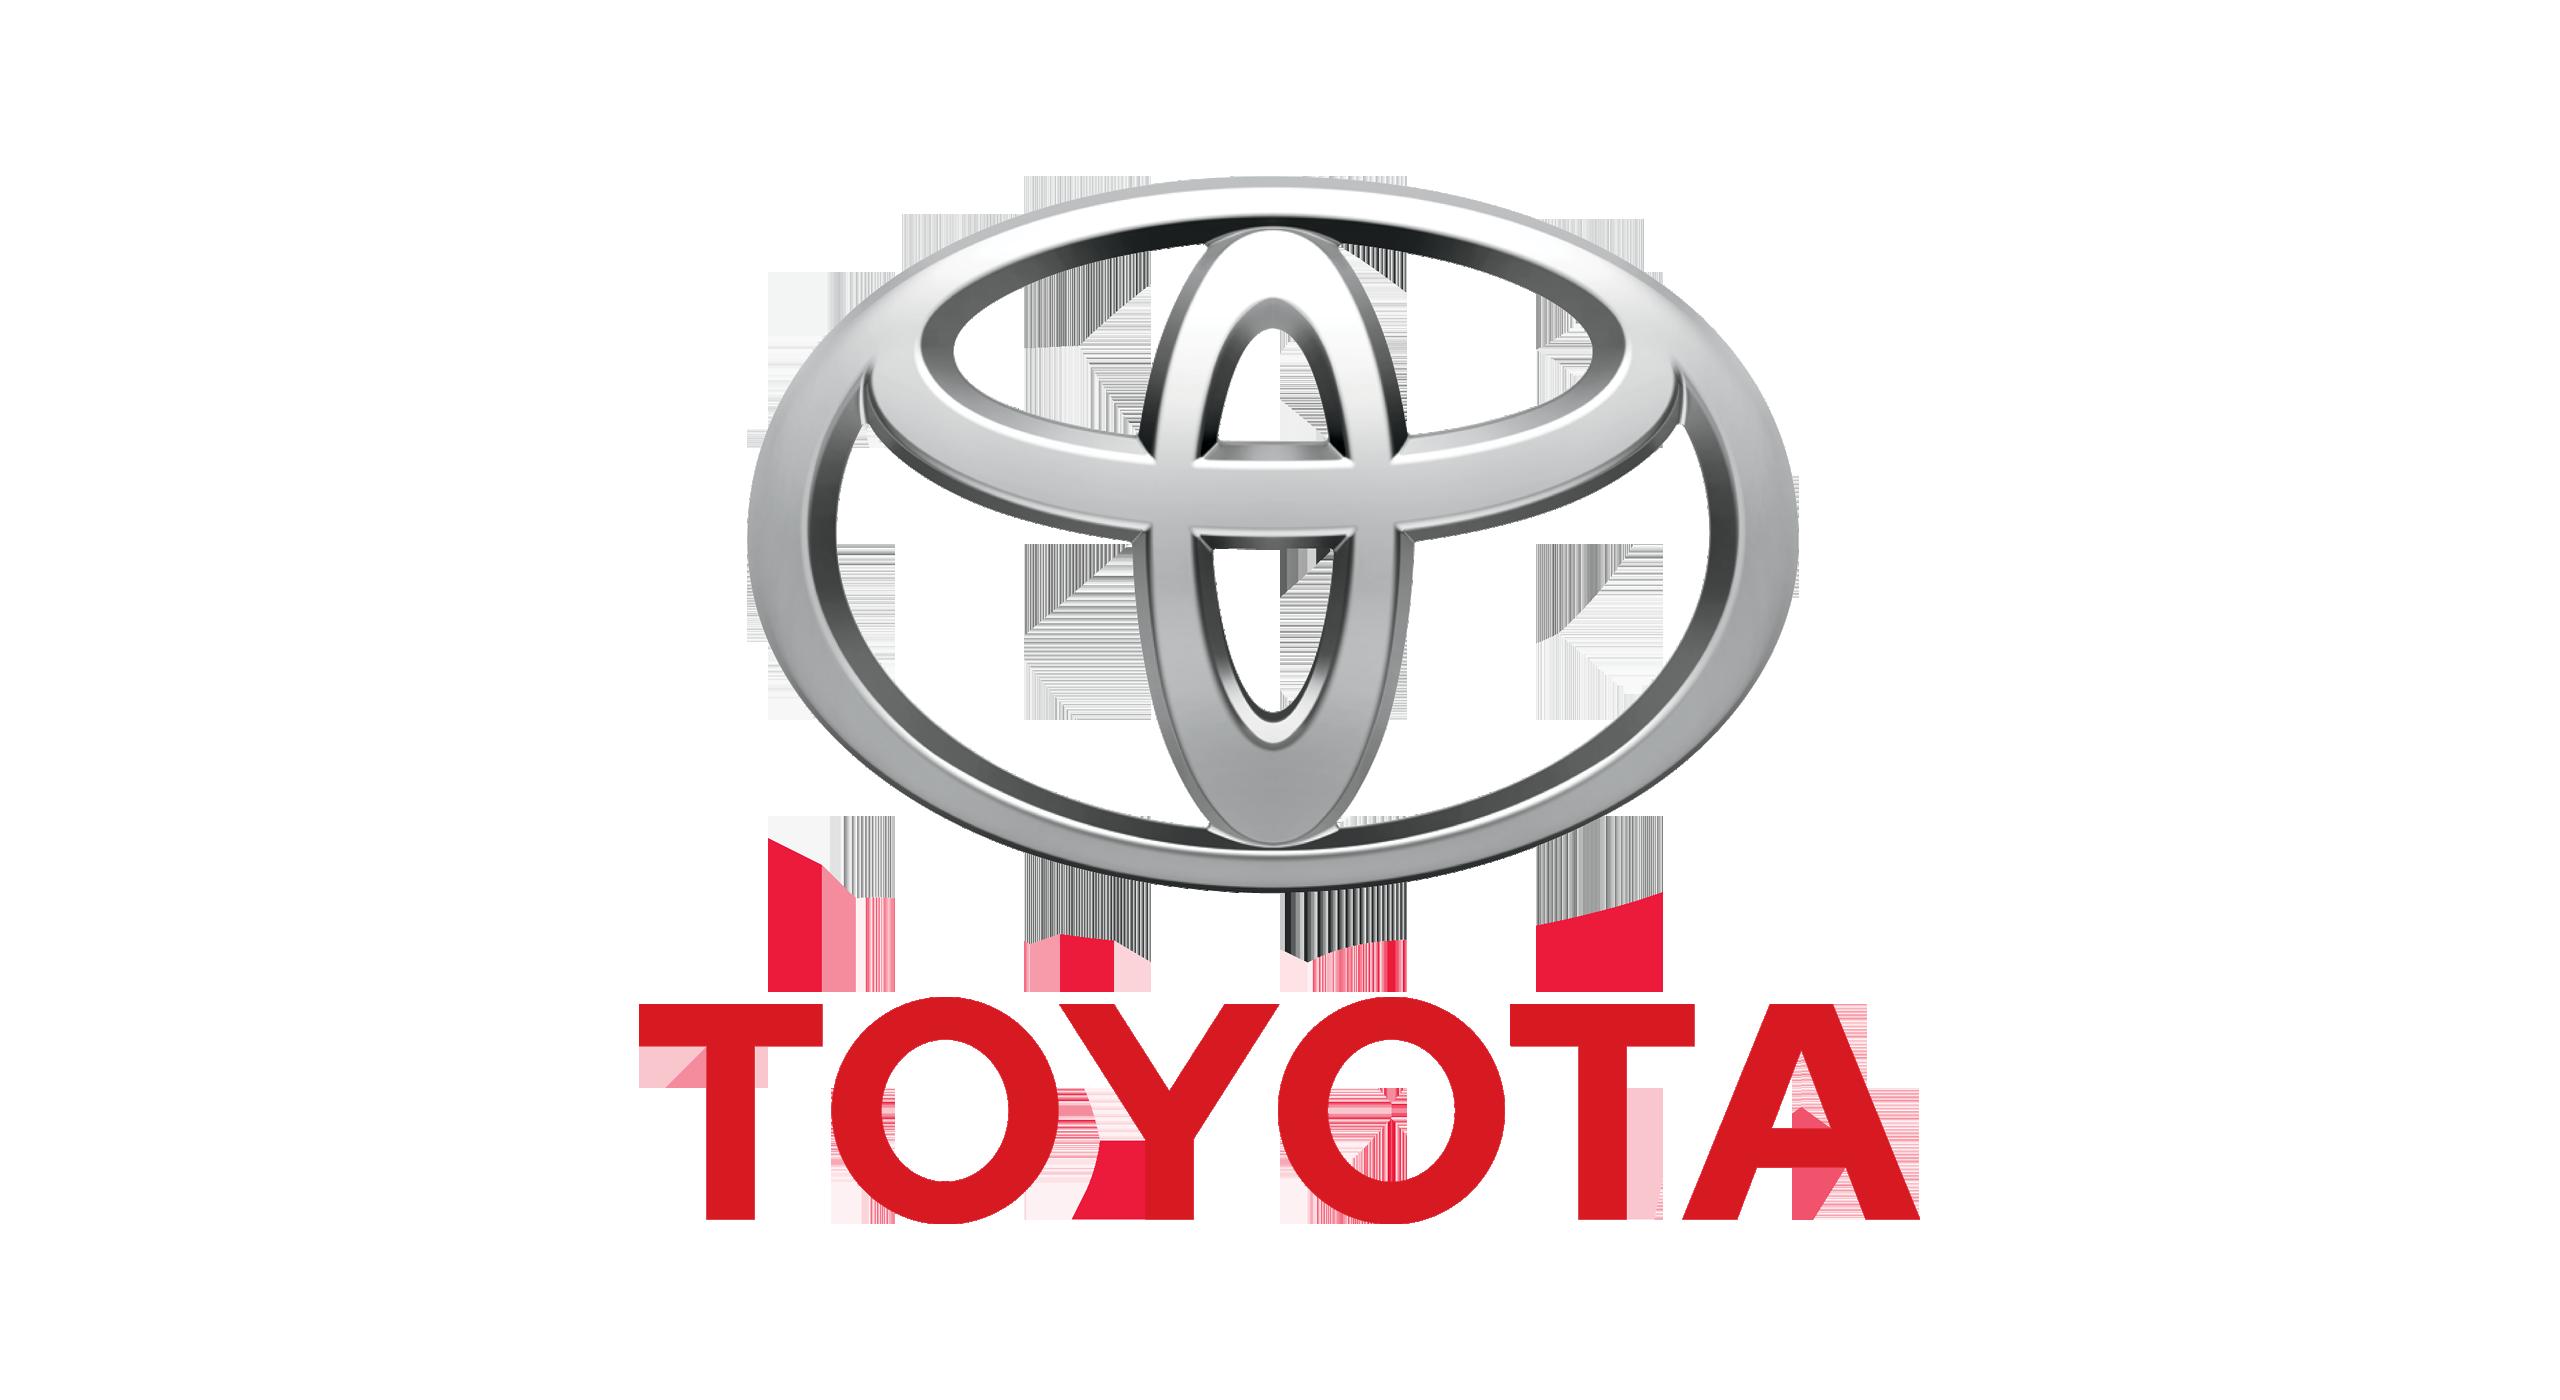 https://jomat.com/wp-content/uploads/2018/10/Toyota-logo-1989-2560x1440.png